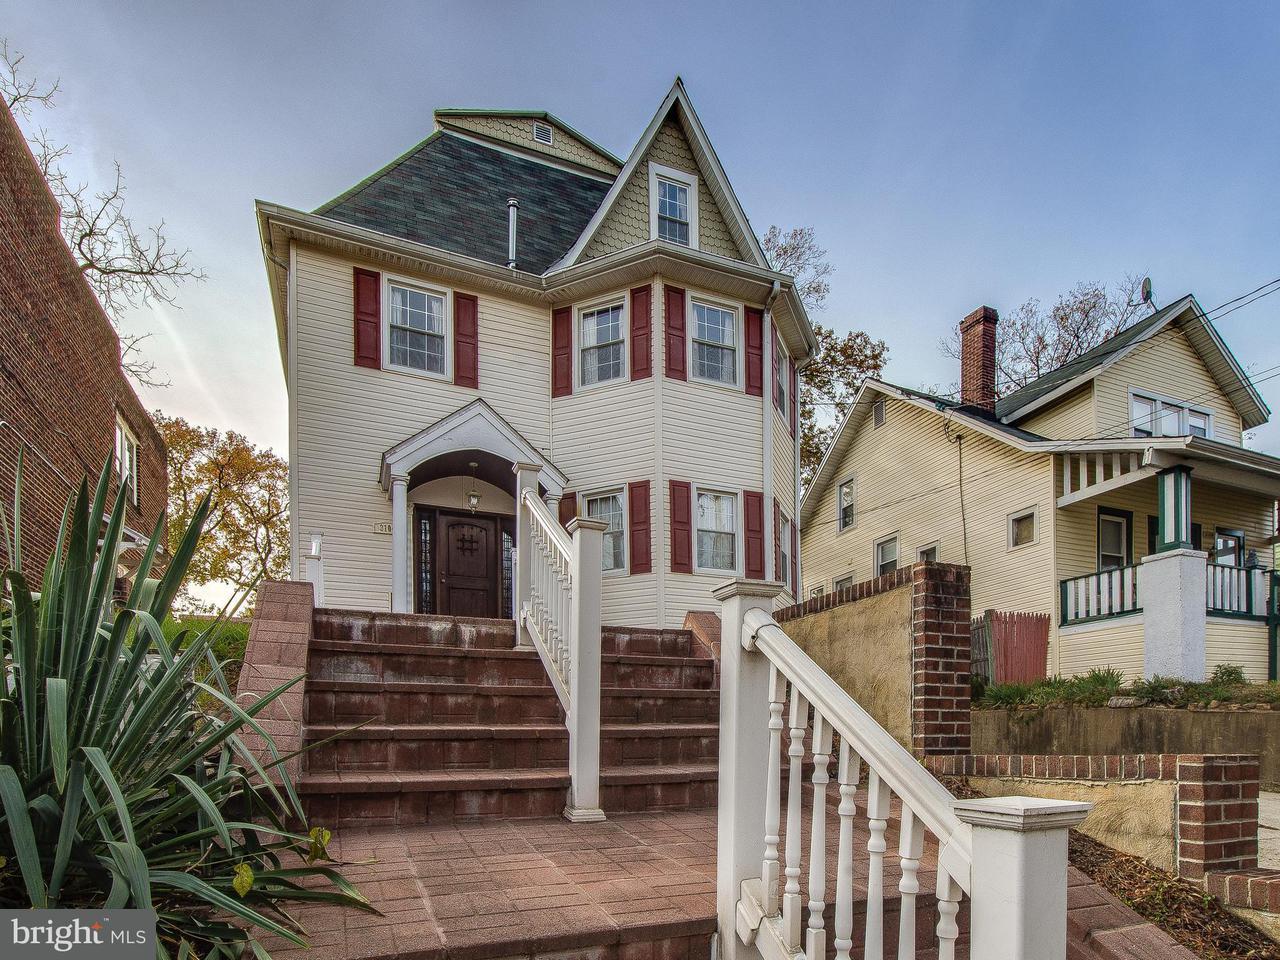 Single Family Home for Sale at 3104 SOUTH DAKOTA AVE NE 3104 SOUTH DAKOTA AVE NE Washington, District Of Columbia 20018 United States